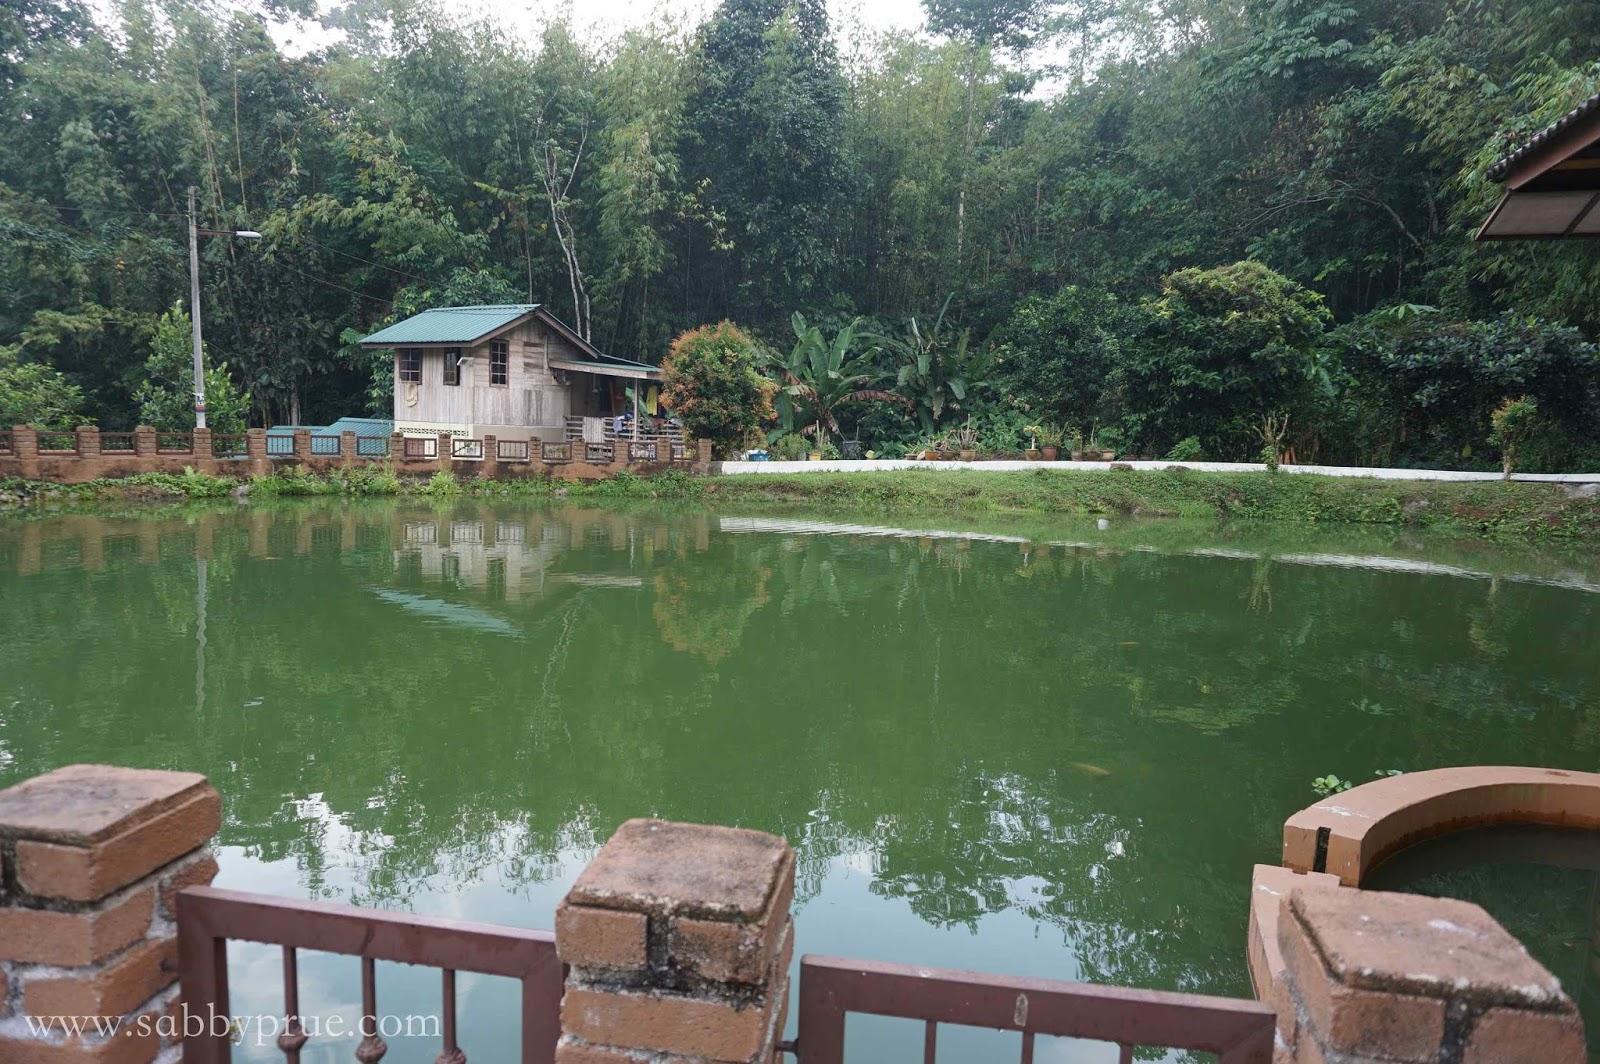 travel lifestyle a weekend at ajlaa village sabby prue